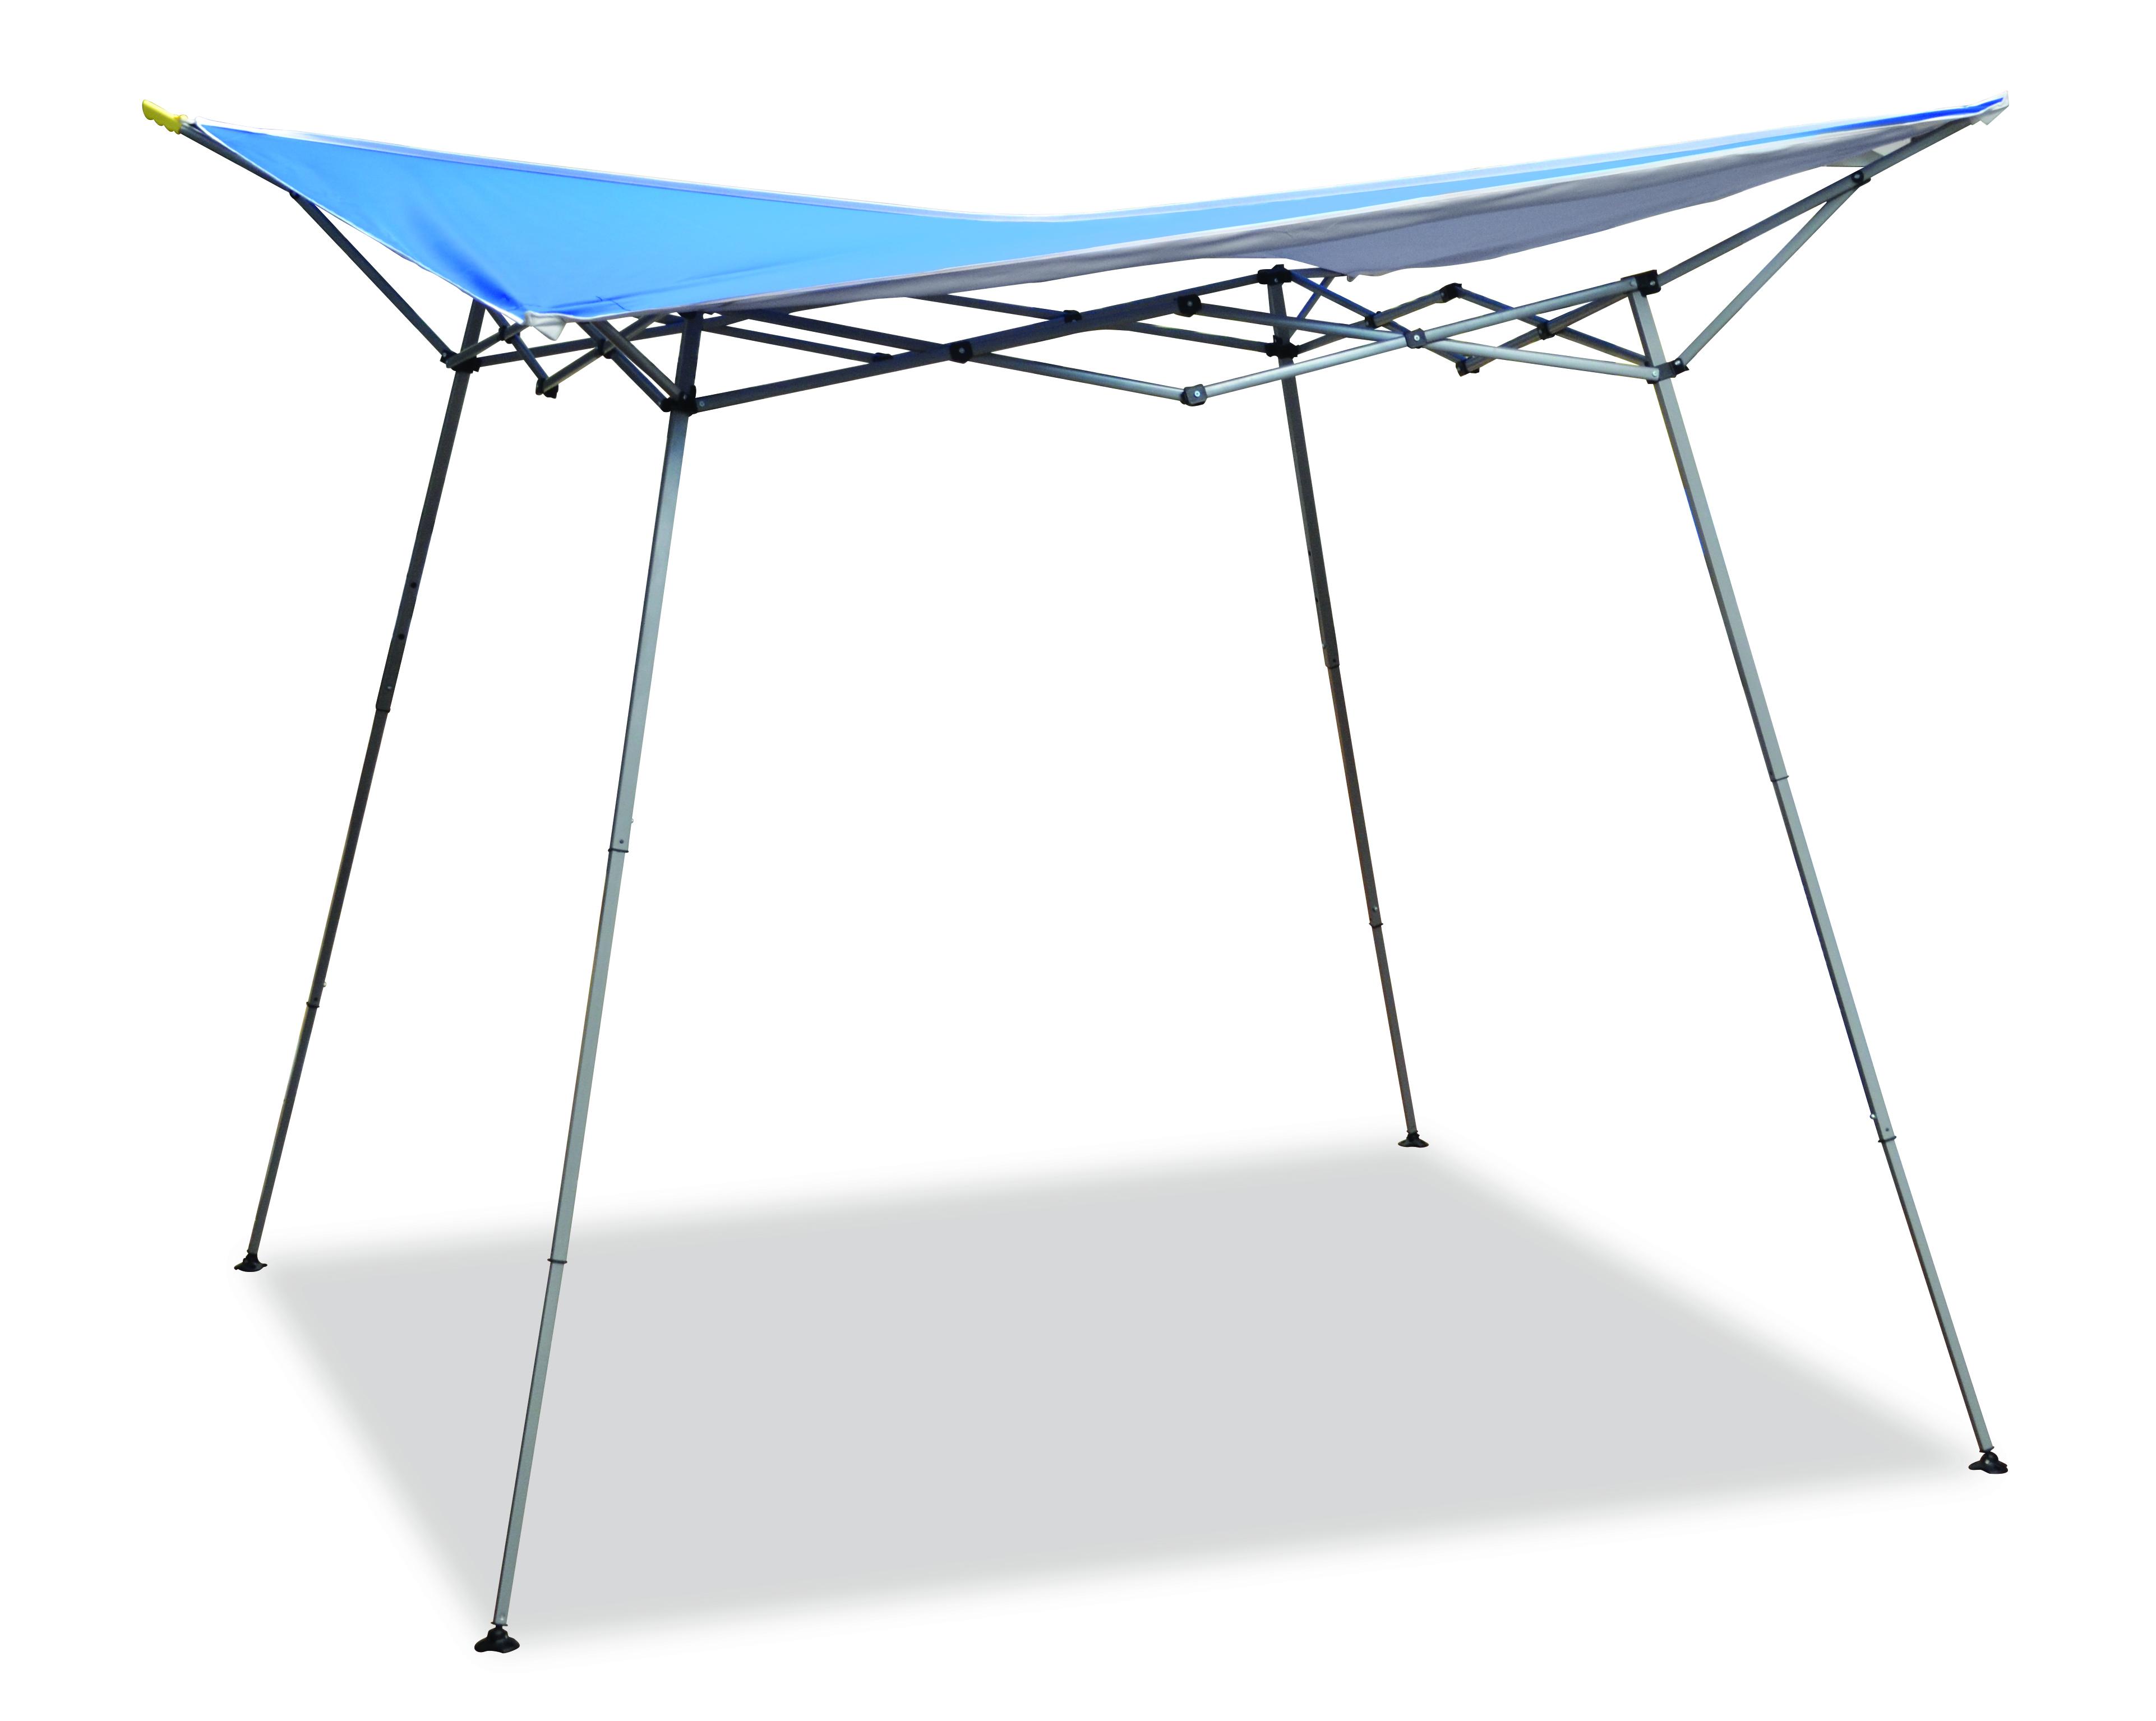 8'x8' Evo shade Blue(White Frame)